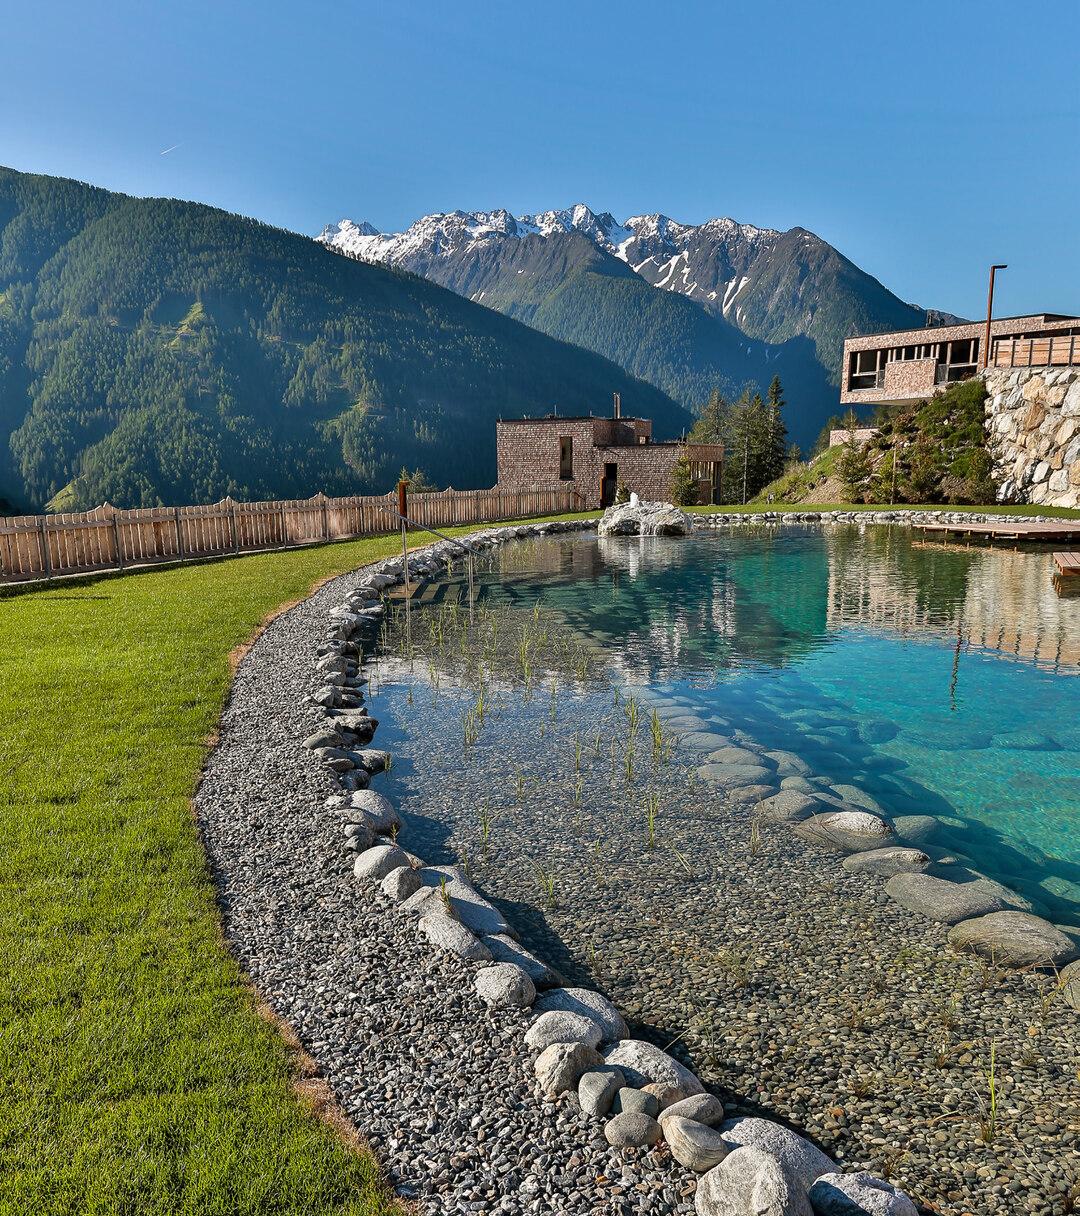 Page 1 of Gradonna Resort - Mountain paradise in Austria